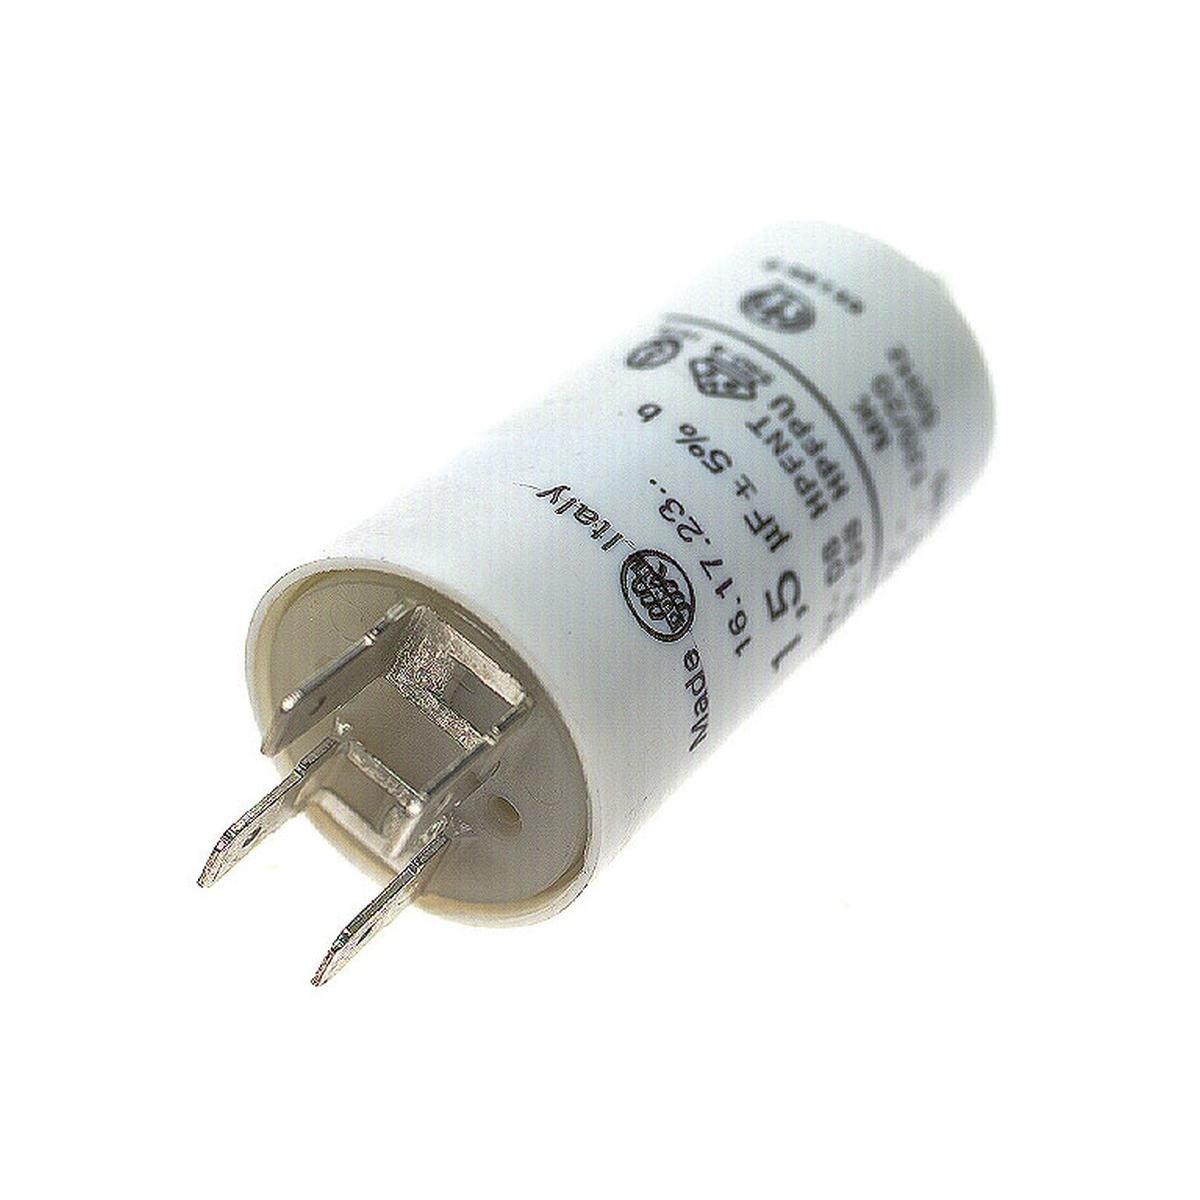 Kondensator 30,0 µF 450V